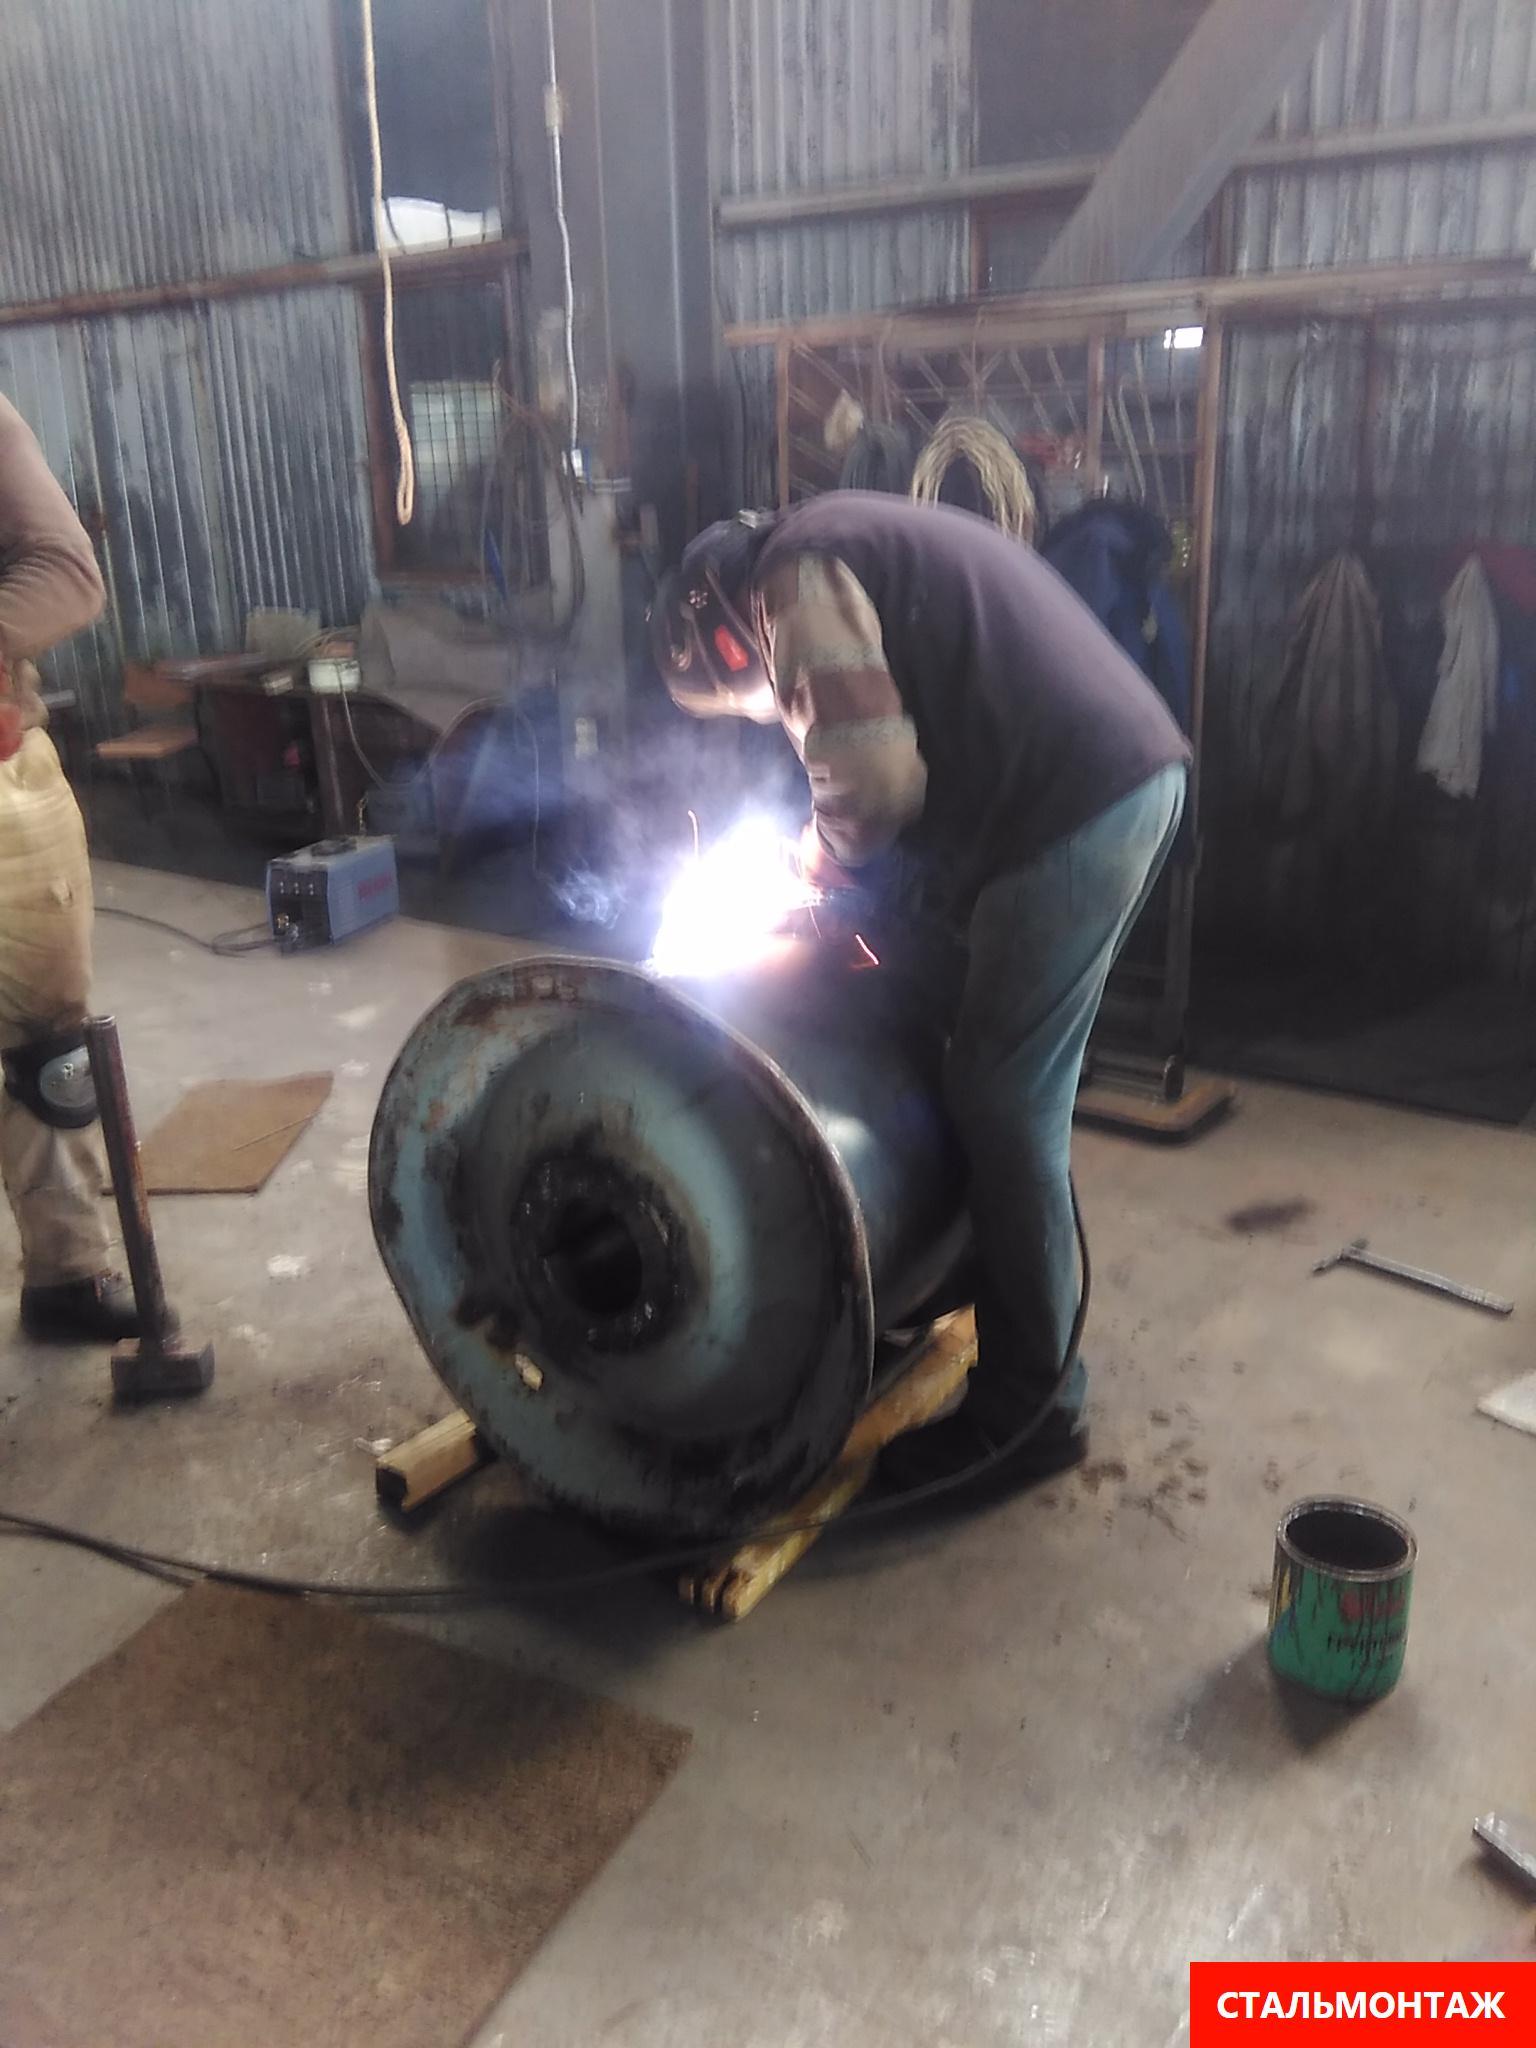 Сварка металлоконструкций на производстве